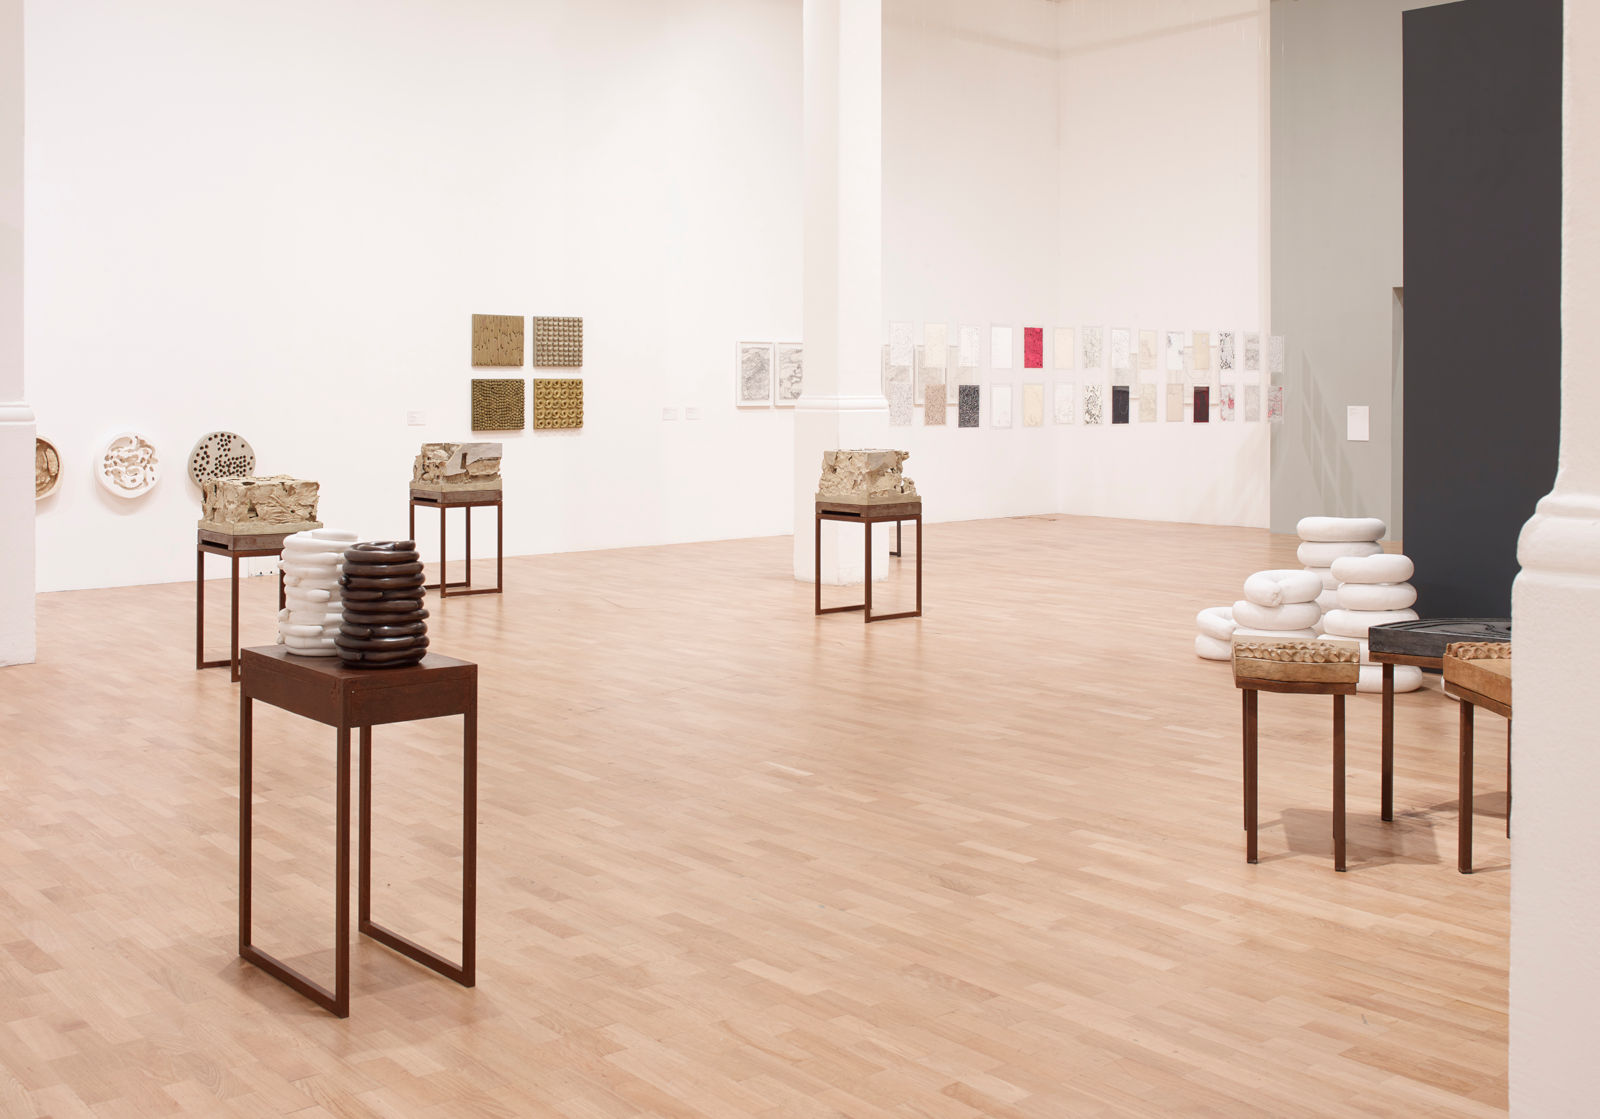 Whitechapel Gallery Anna Maria Maiolino 1